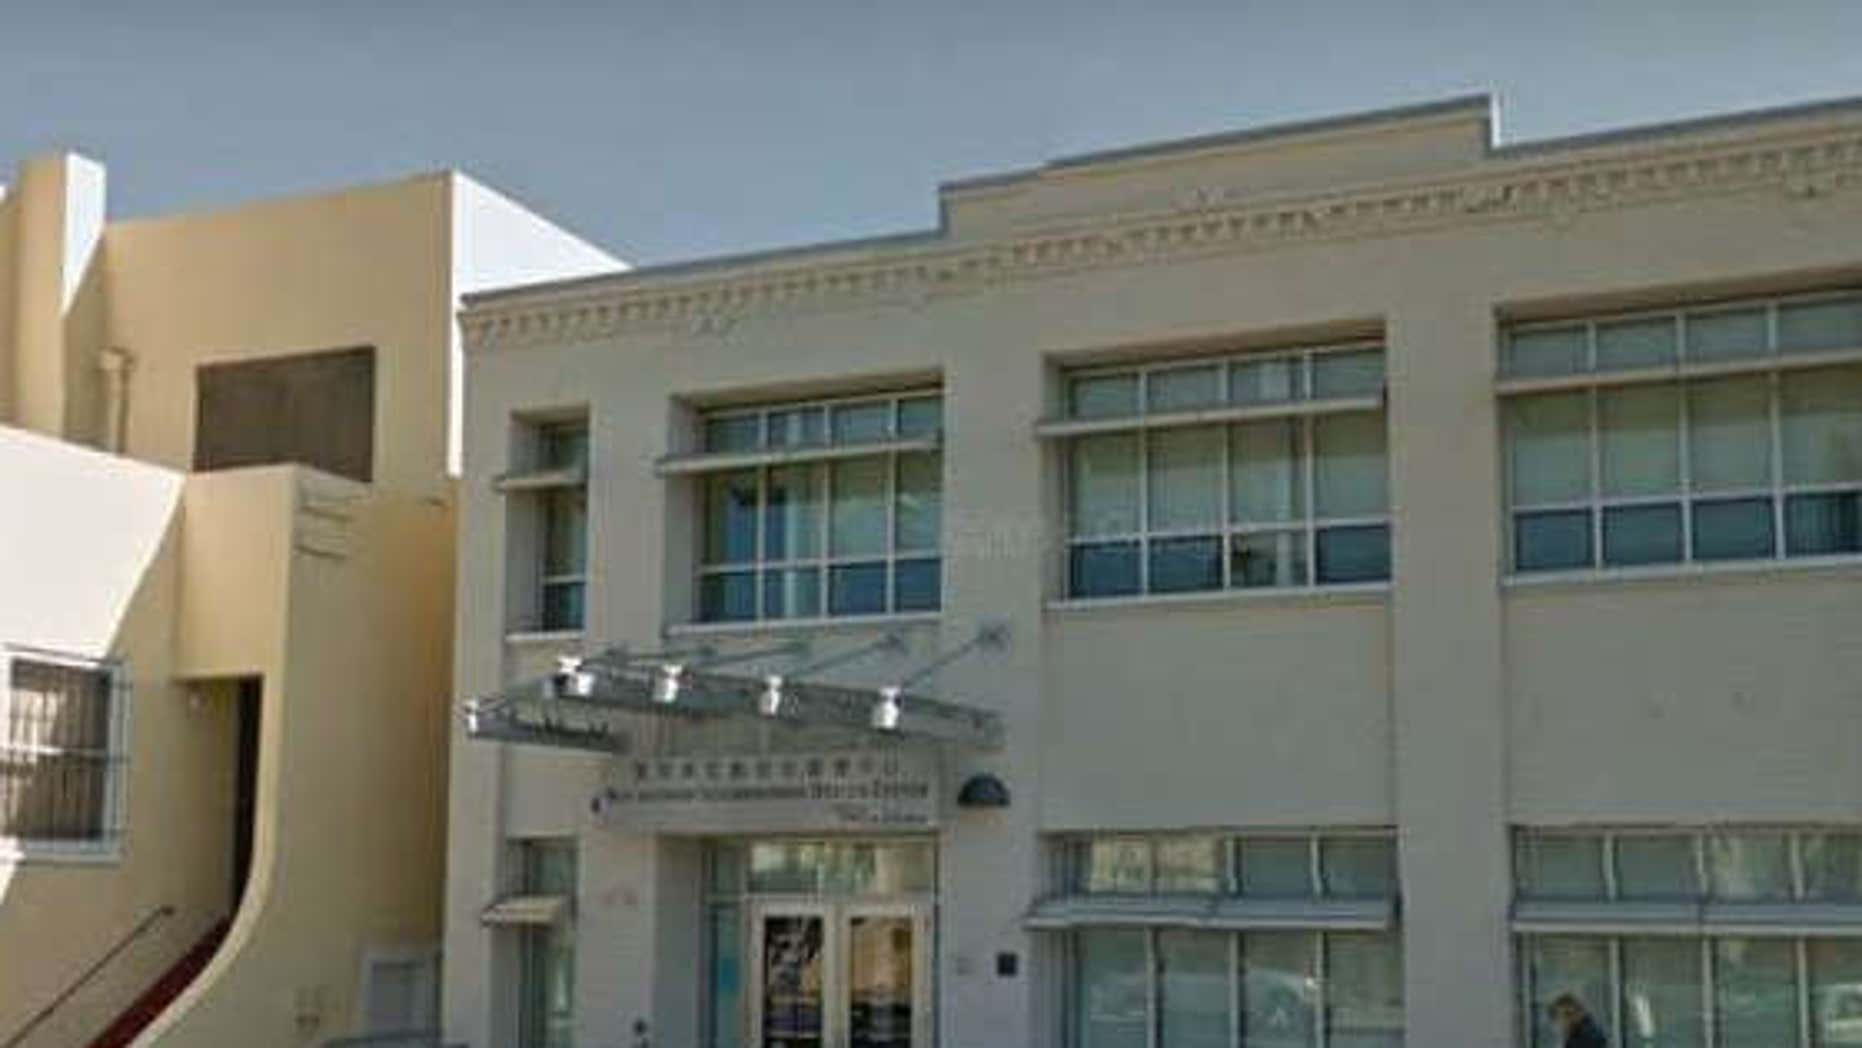 San Antonio Neighborhood Health Center in Oakland, Calif.